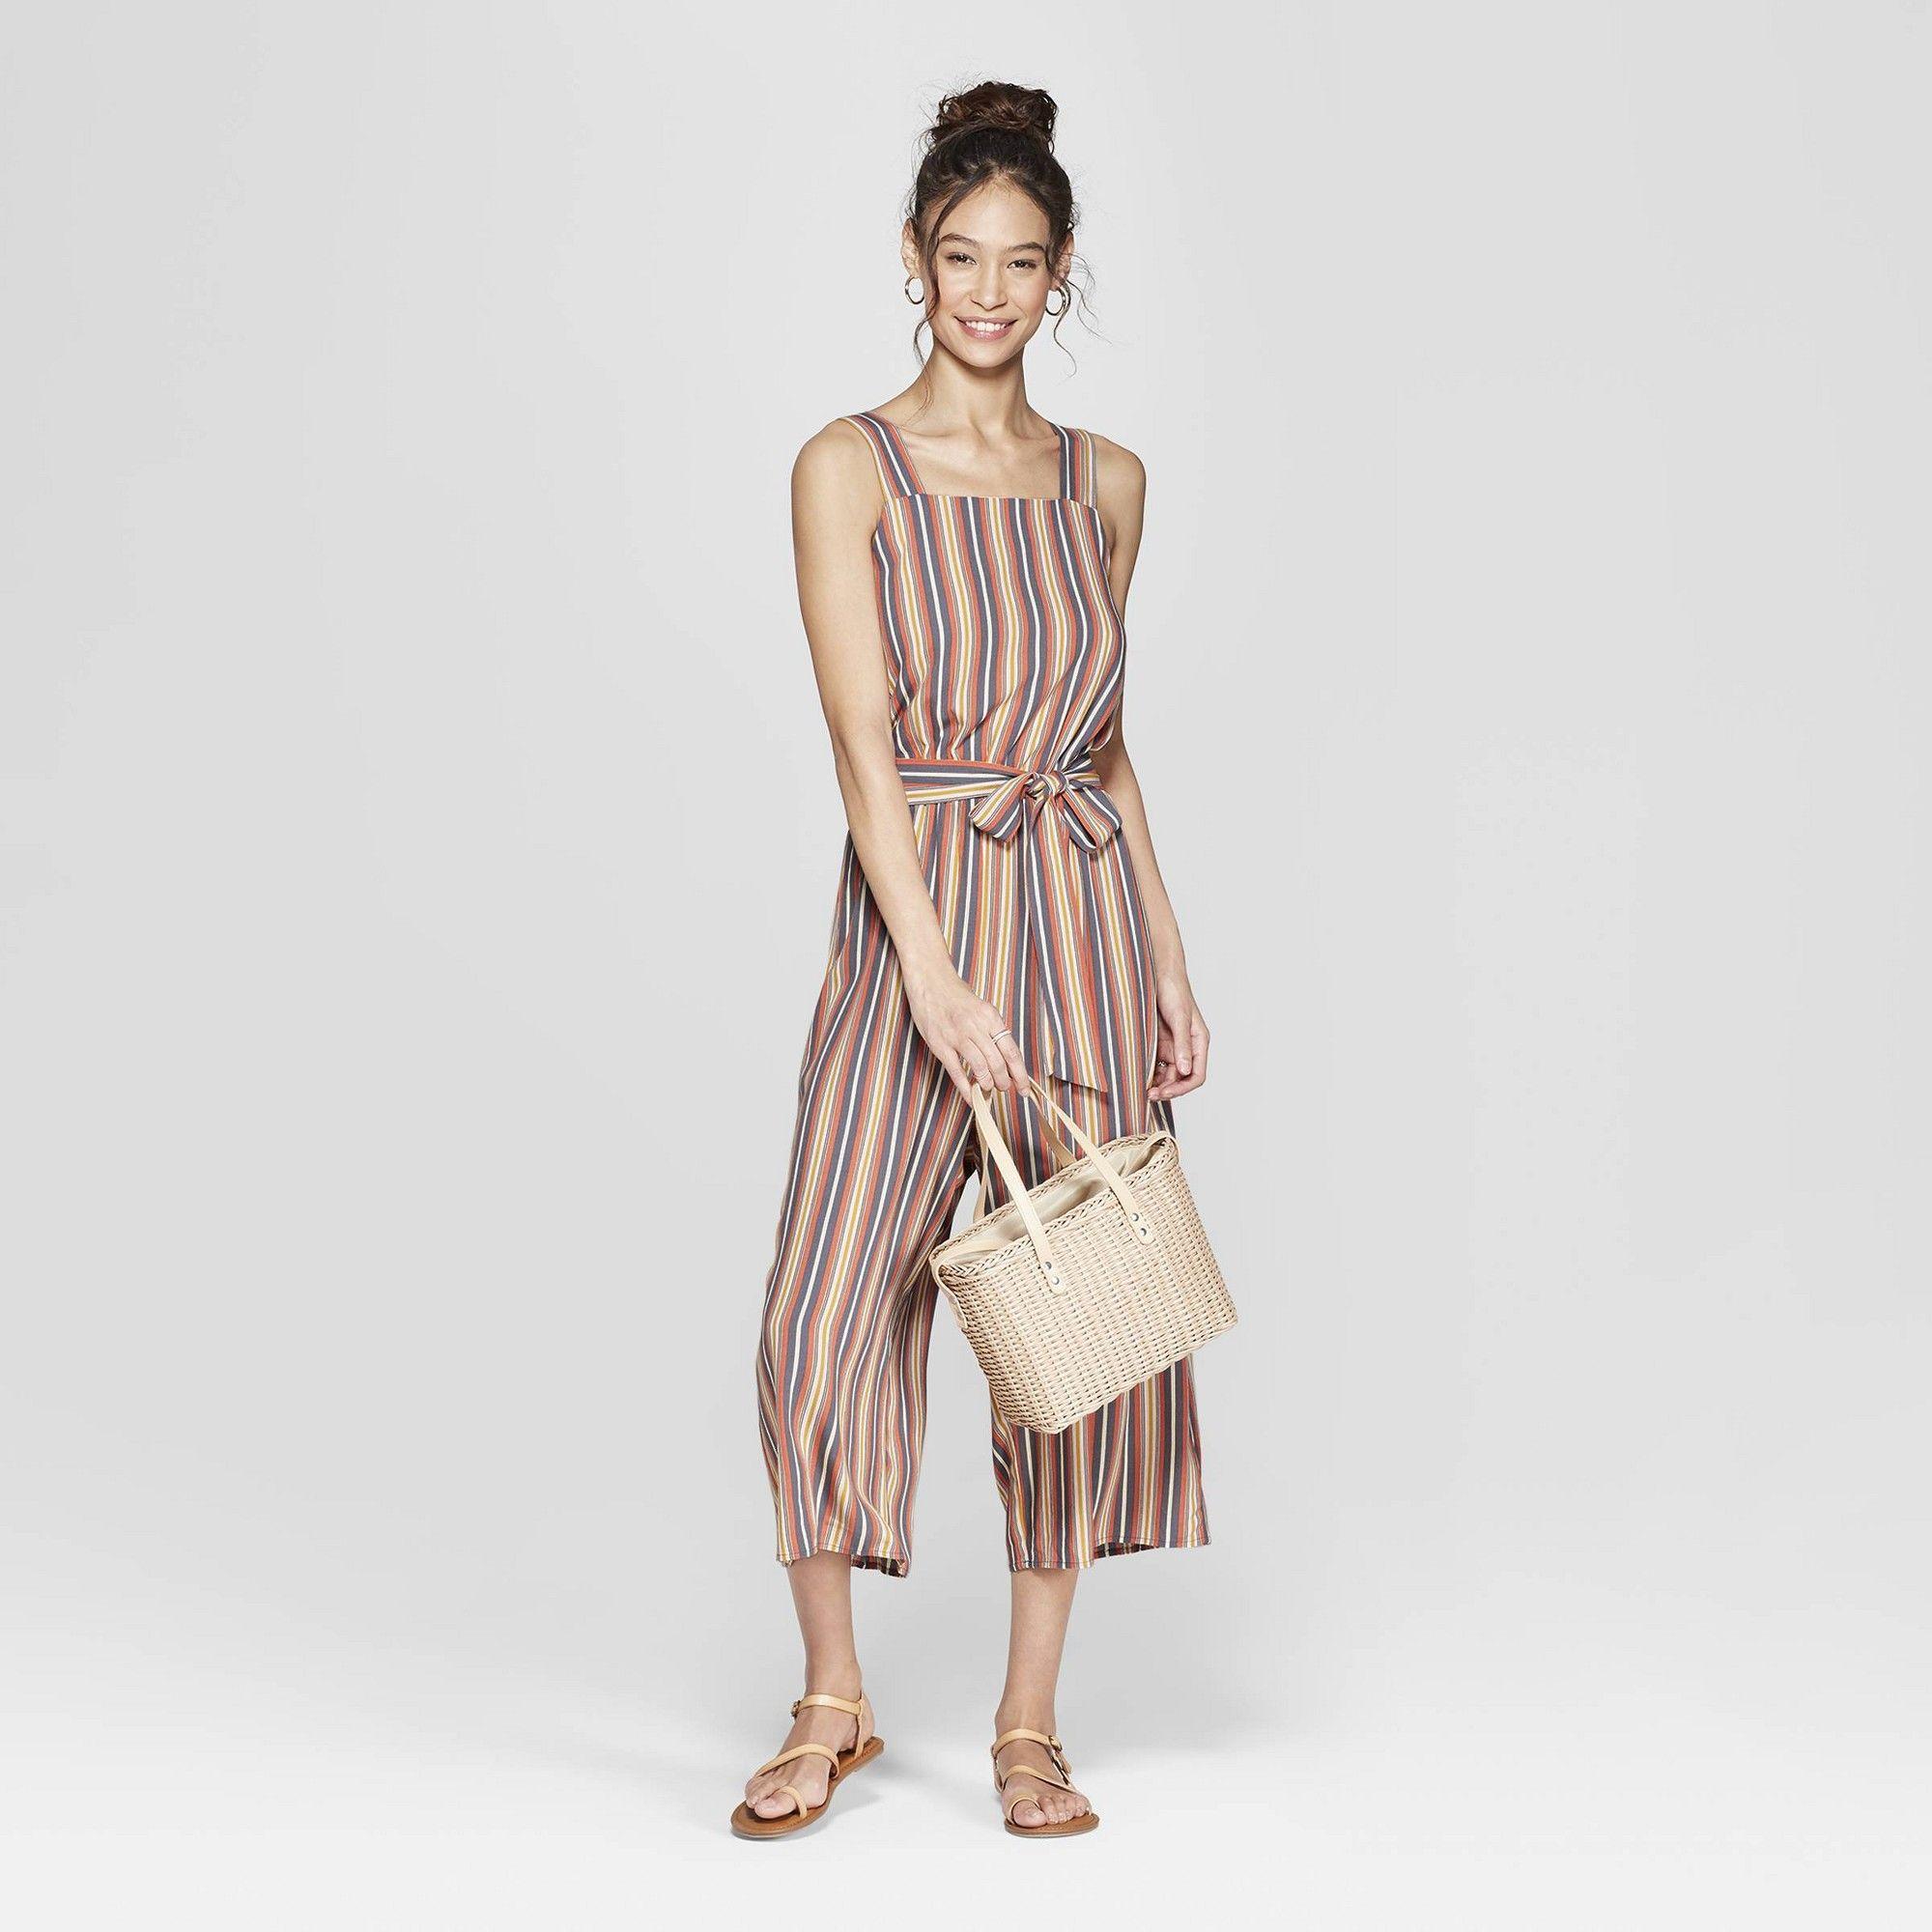 5f16019ad6 Women's Striped Strappy Square Neck Waist Tie Jumpsuit - Xhilaration Orange  Xxl